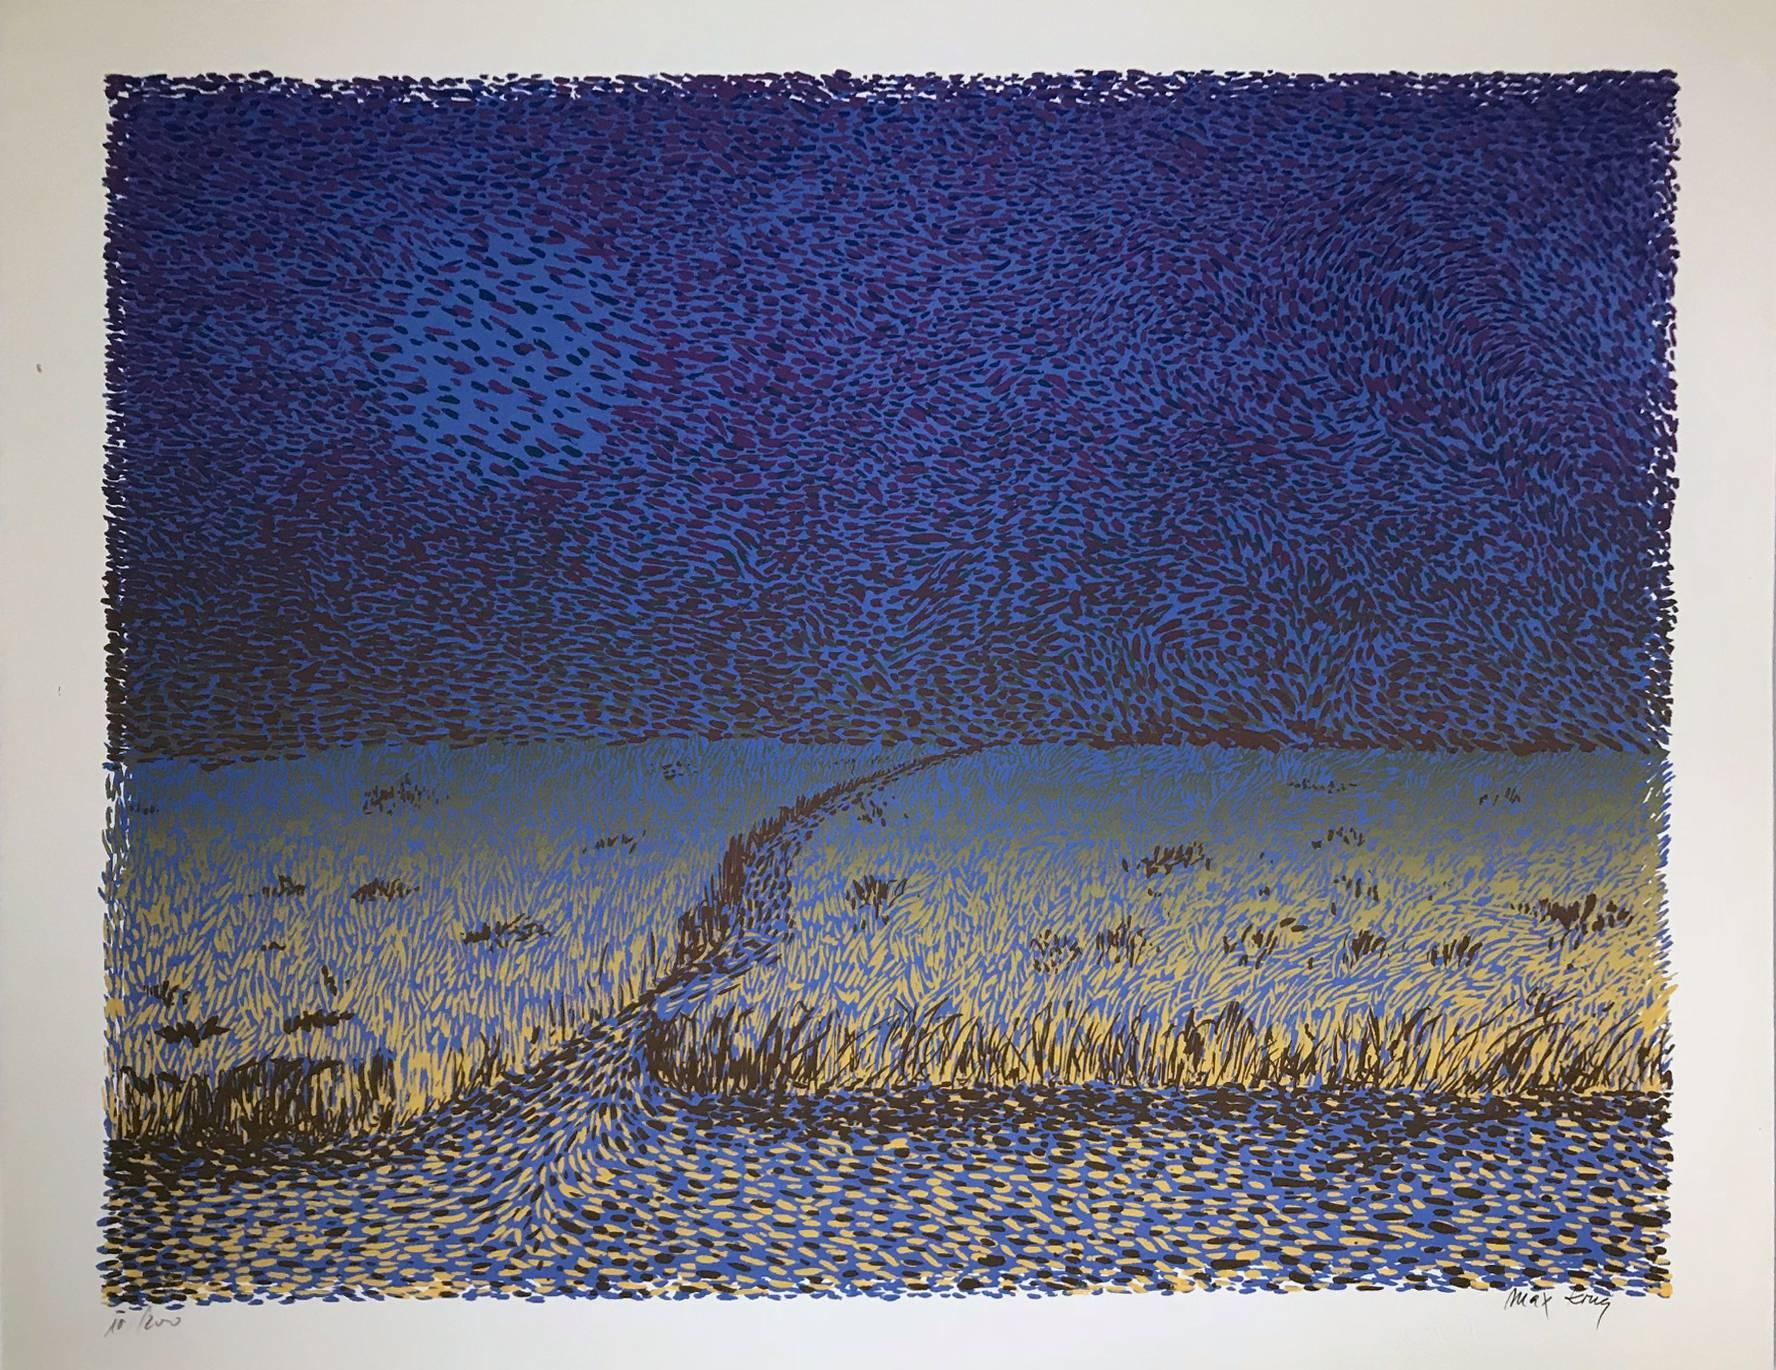 Untitled: Purple, Blue & Gold Landscape (Edition 39/200)